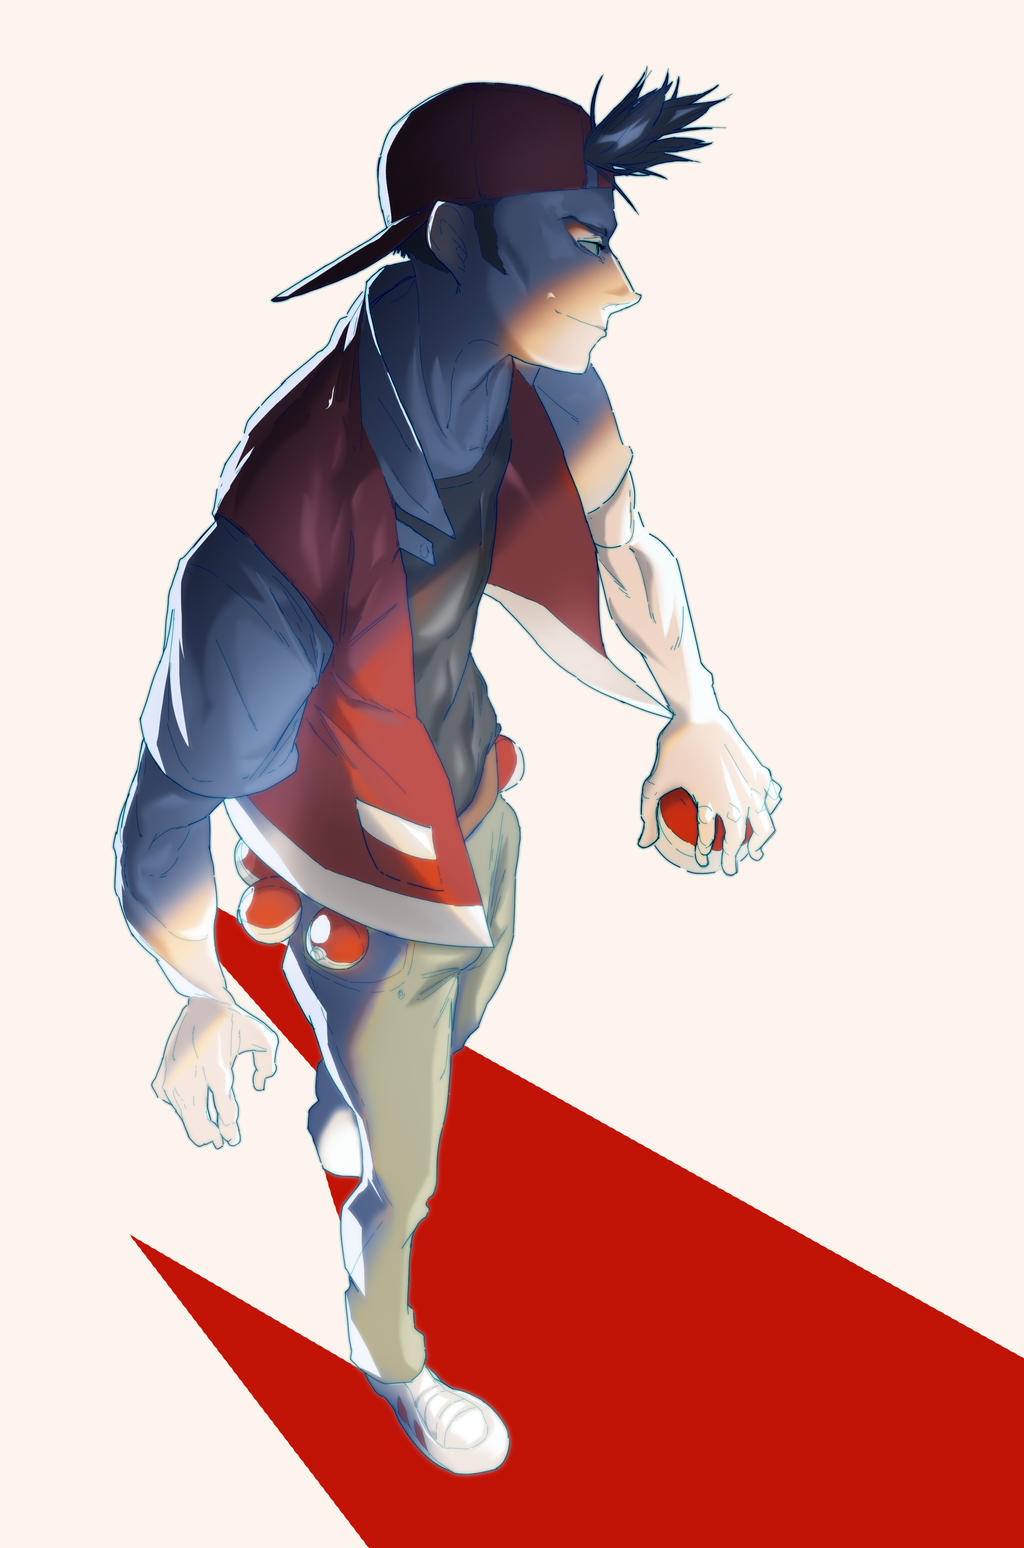 sext pokemon trainer red fanart by alisdaiross on deviantart